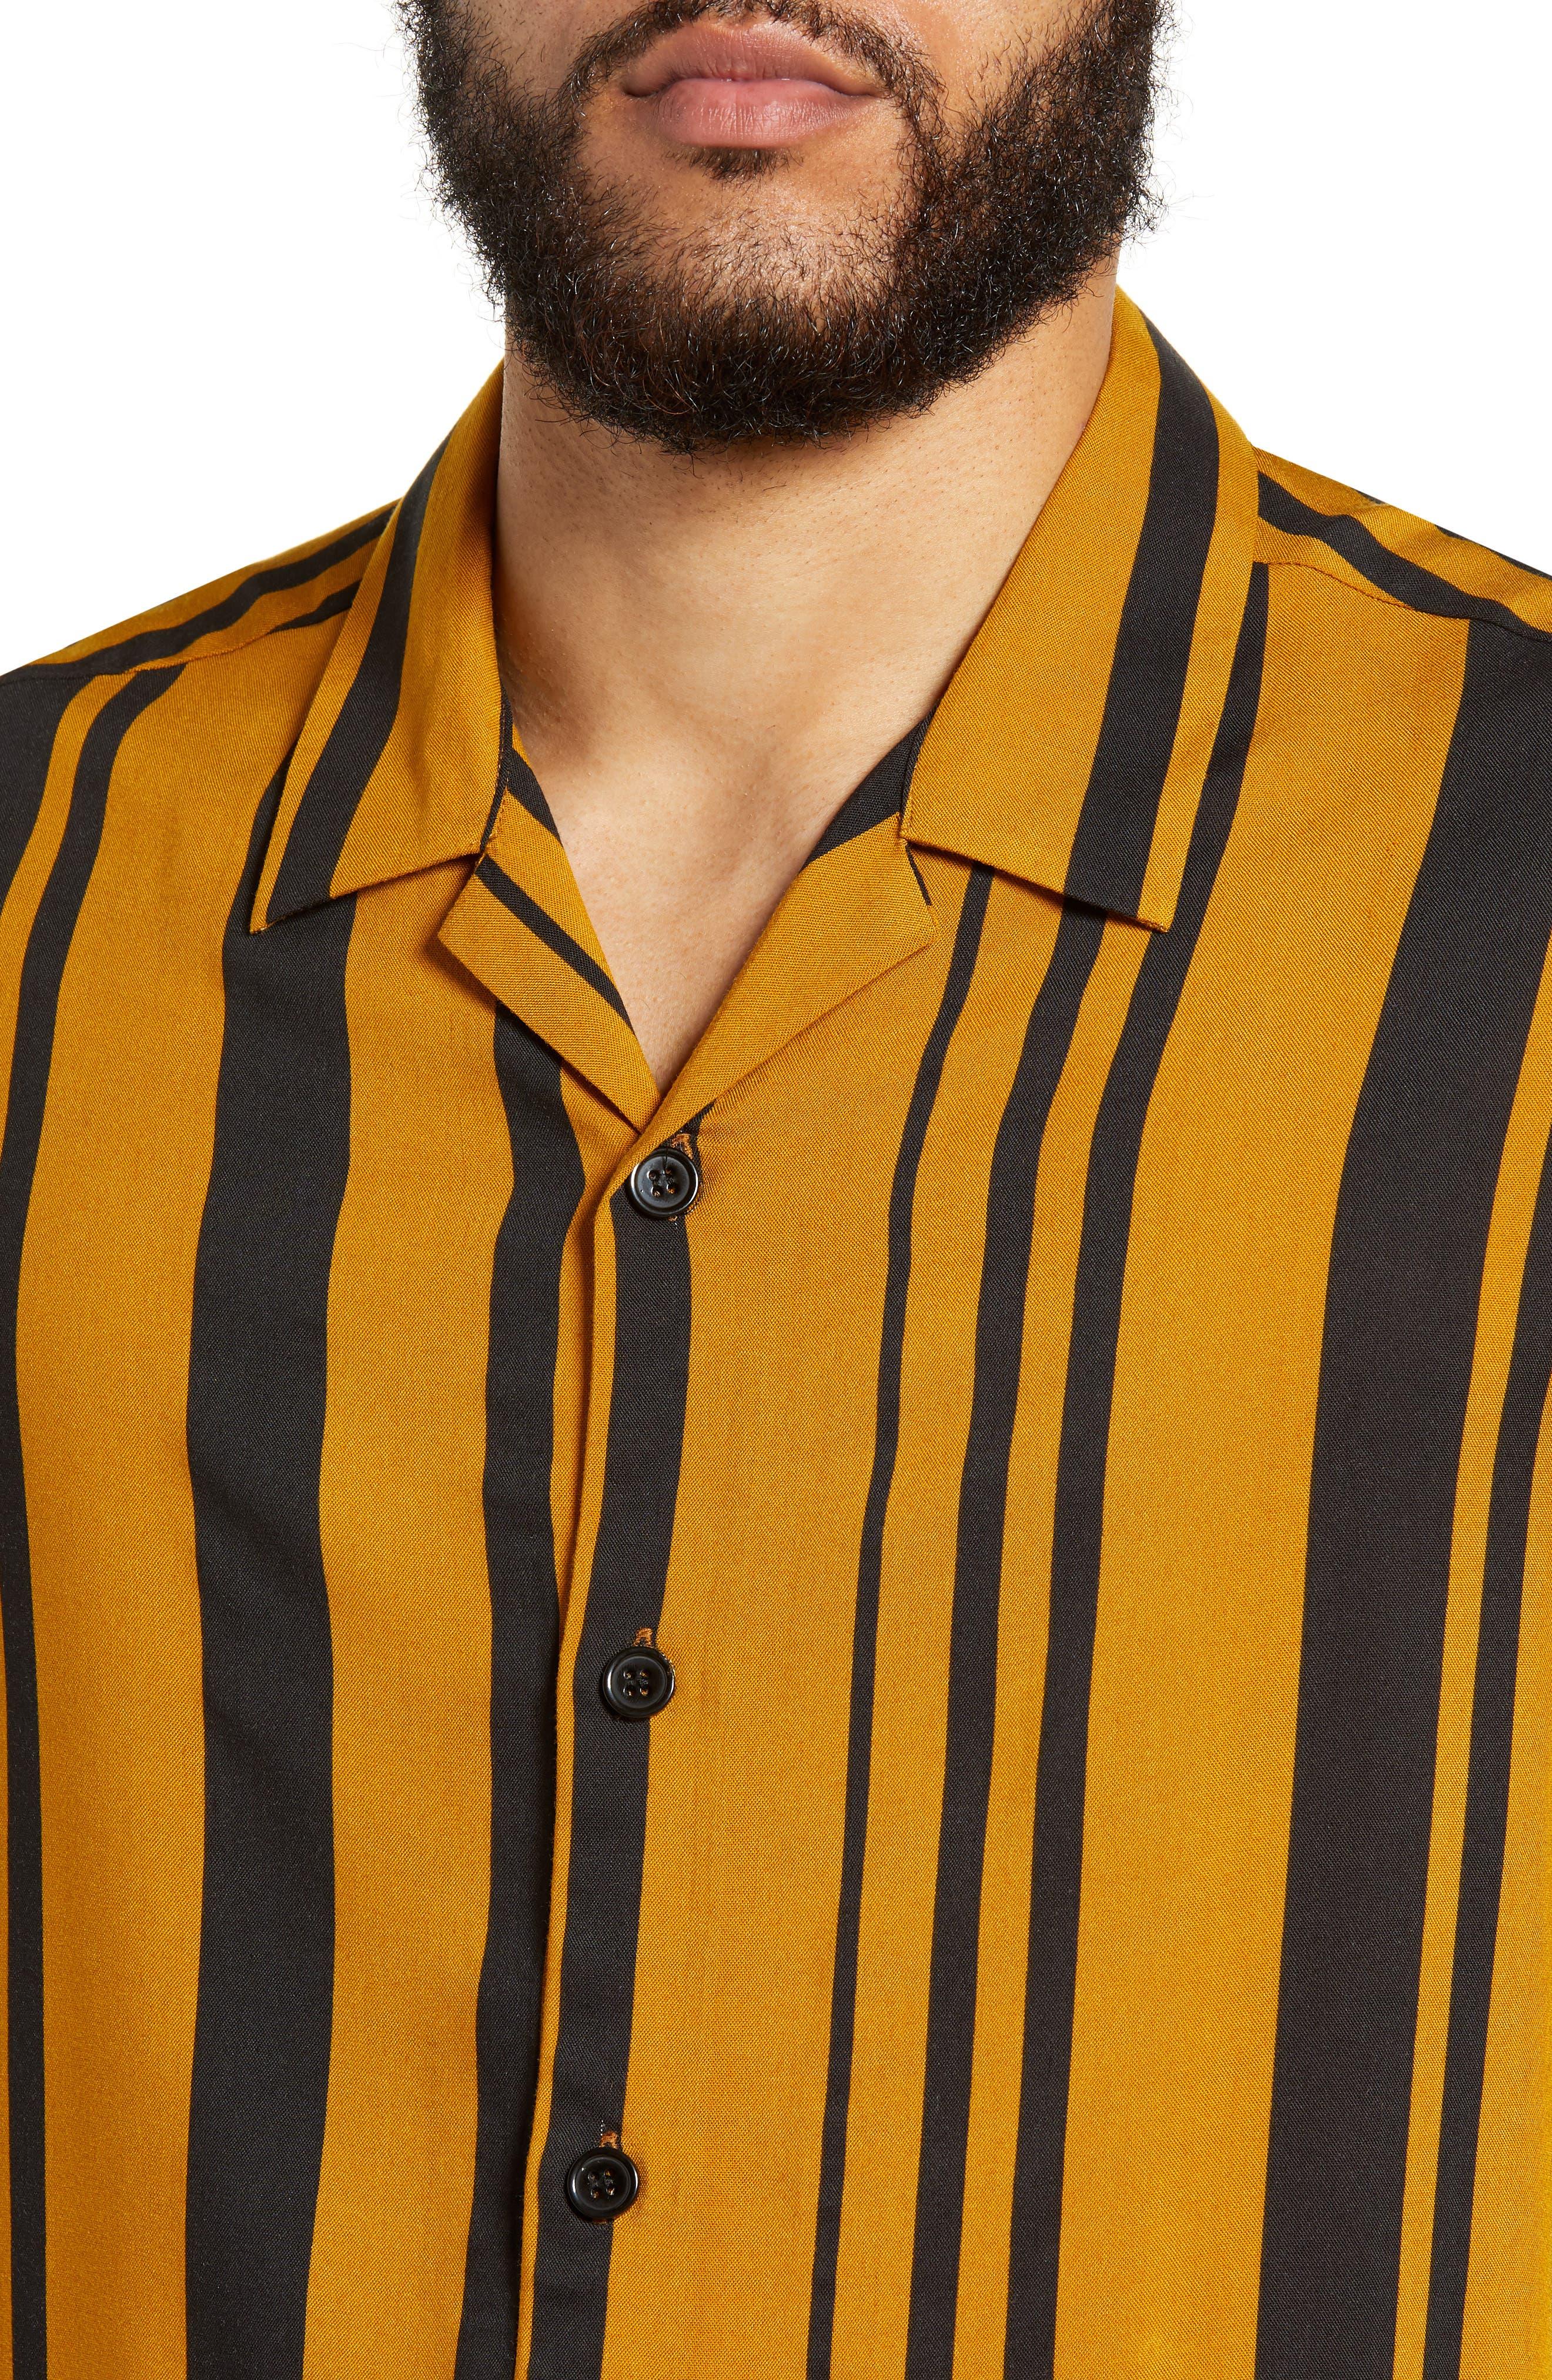 Stripe Classic Fit Shirt,                             Alternate thumbnail 2, color,                             YELLOW MULTI